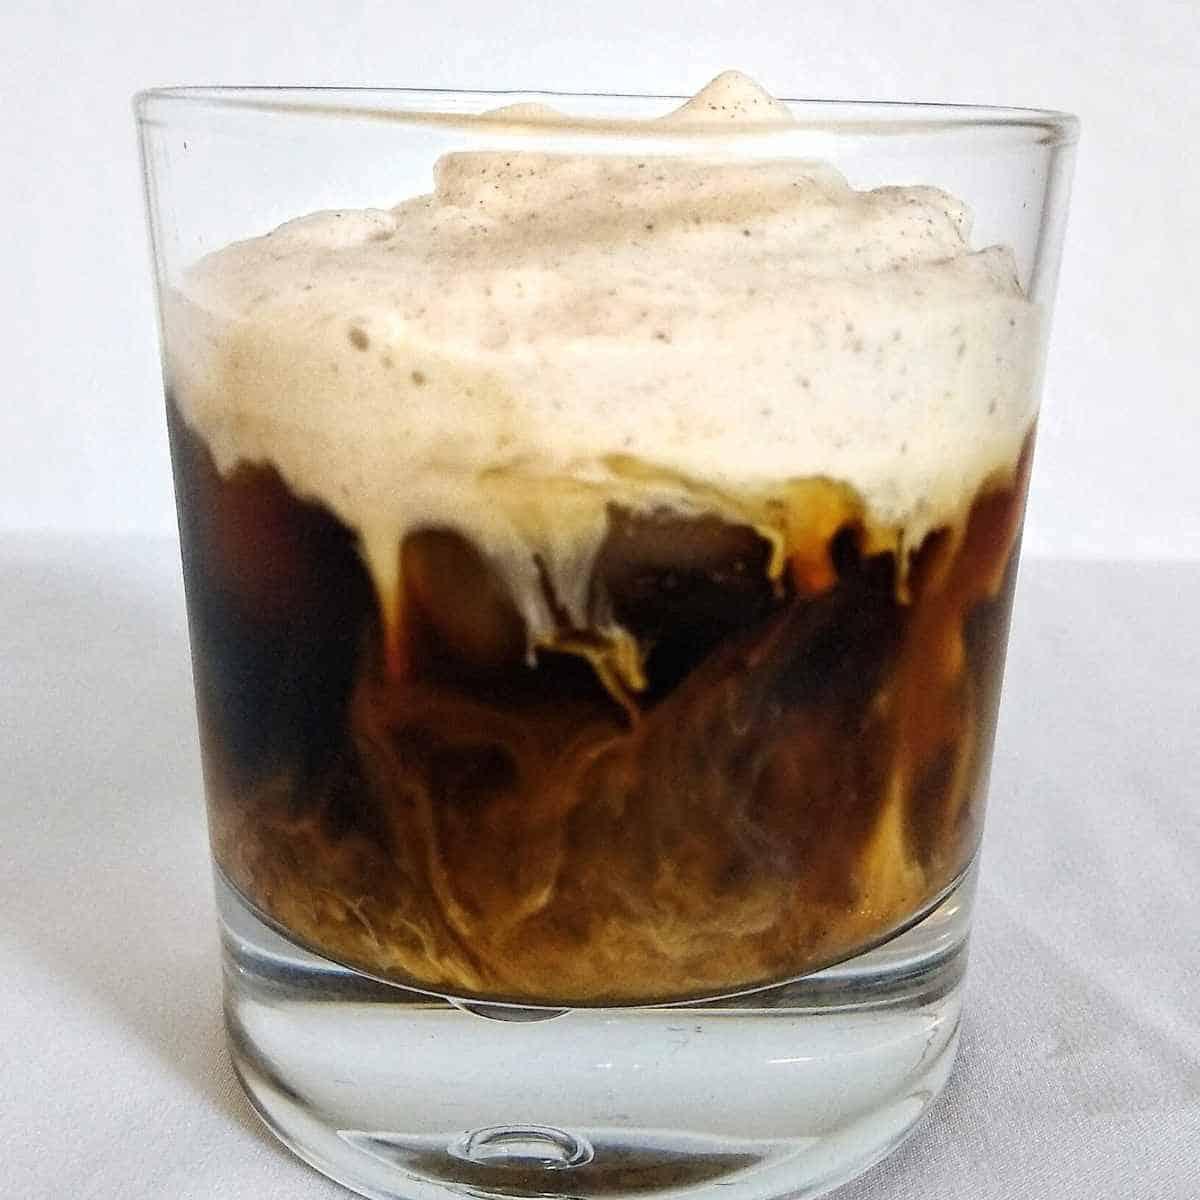 keto cold foam pumpkin brew - Keto Pumpkin Cold Foam: Info from a former Starbuck's Barista